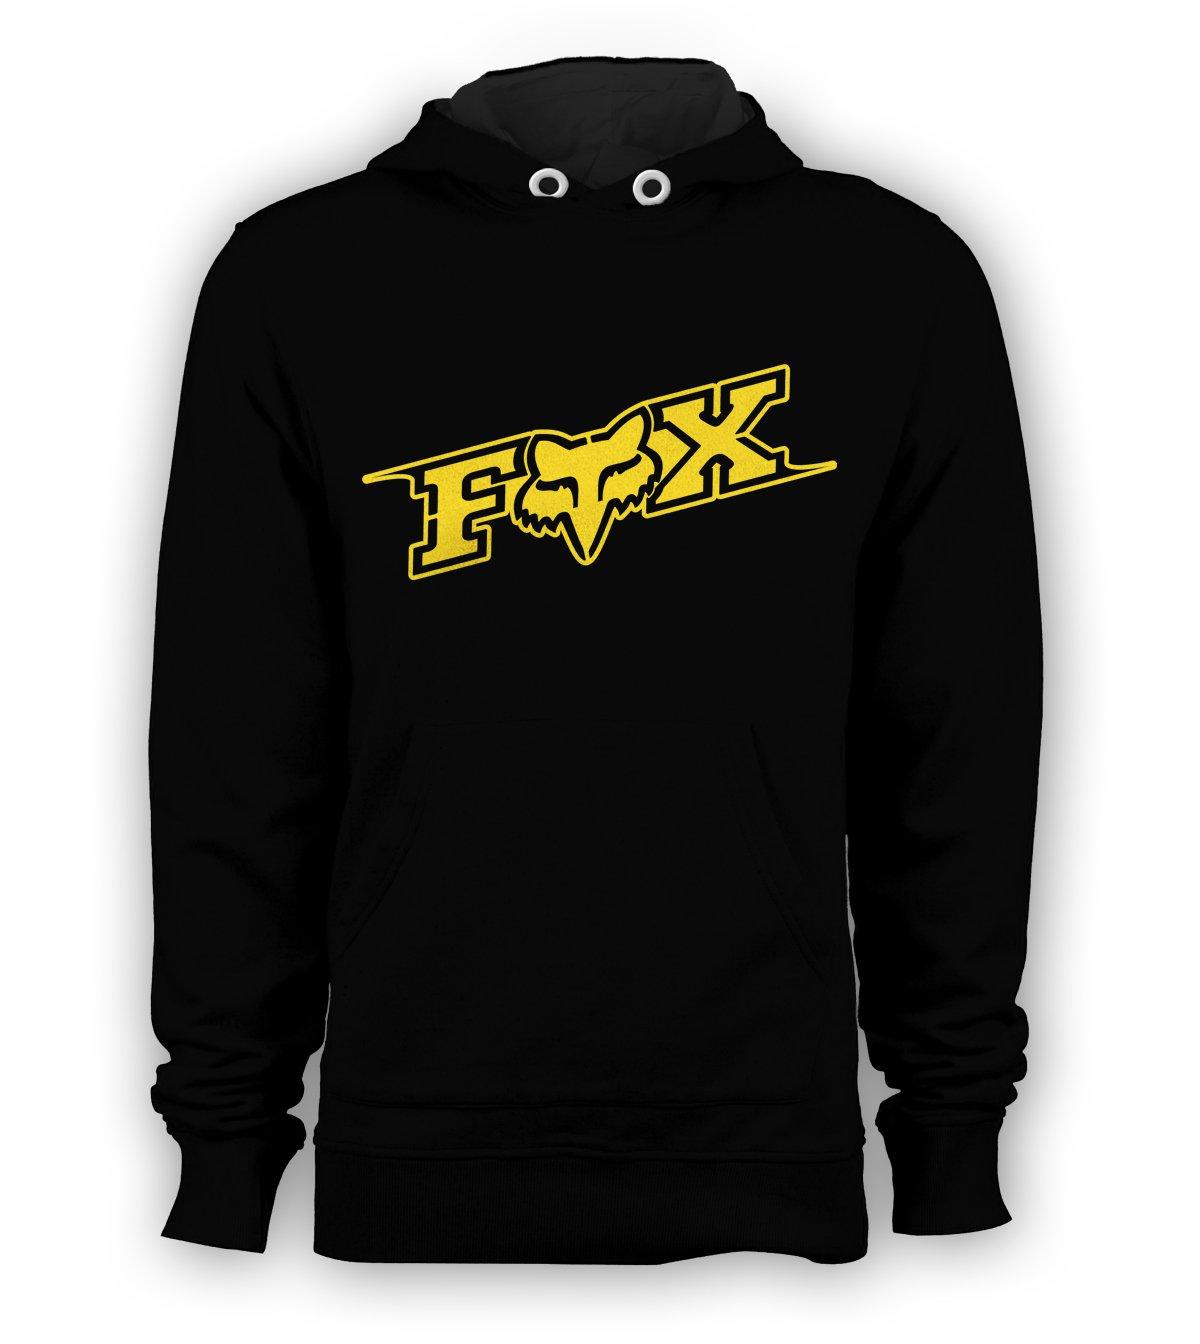 Fox Racing Gold Logo Pullover Hoodie Men BMX Skateboard X-Games Sweatshirts Size S to 3XL New Black